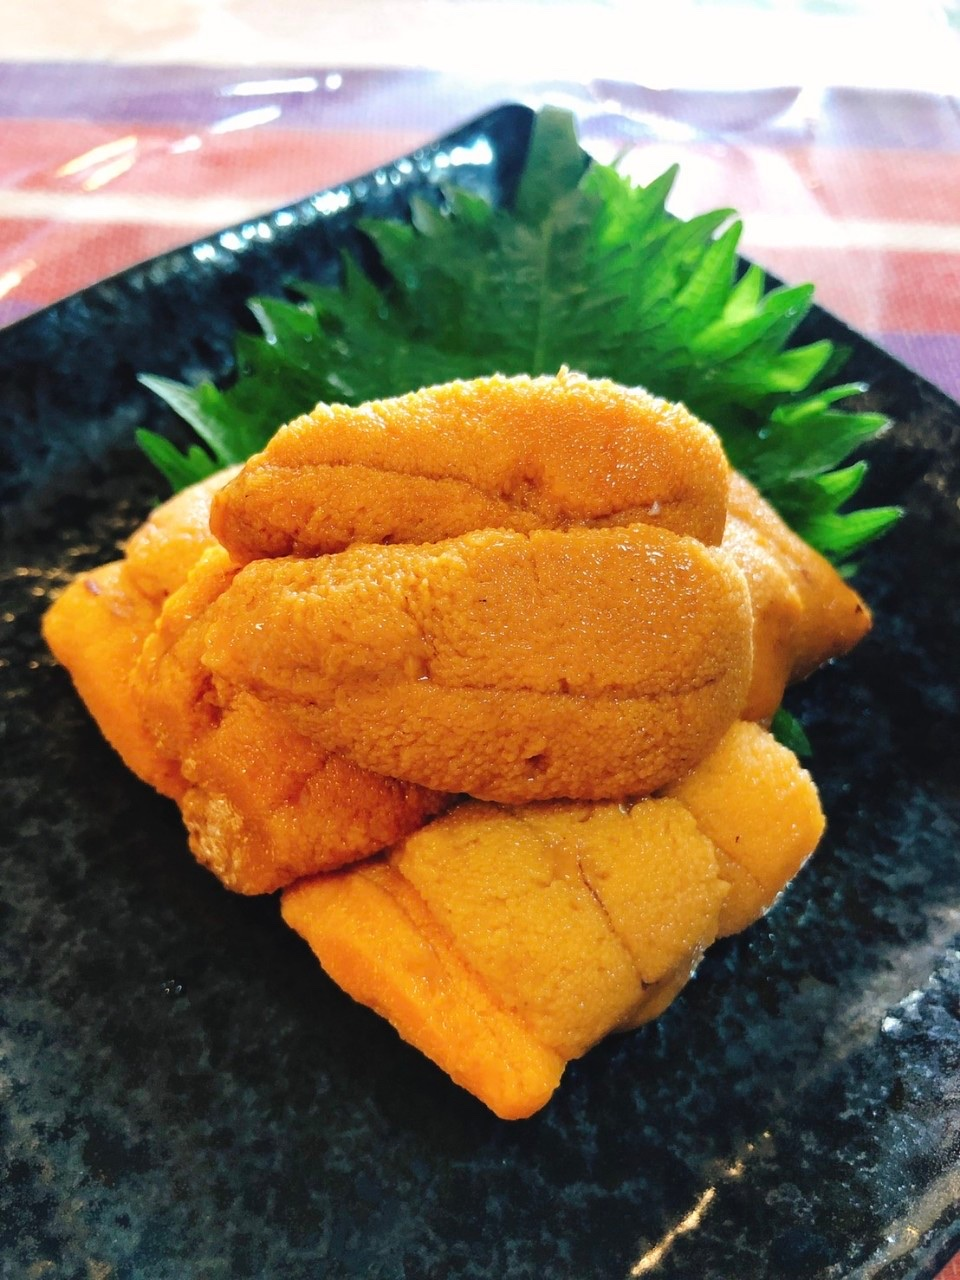 Delicacies of Hokkaido: Feast on Fresh Uni in the Costal Town of Rausu!